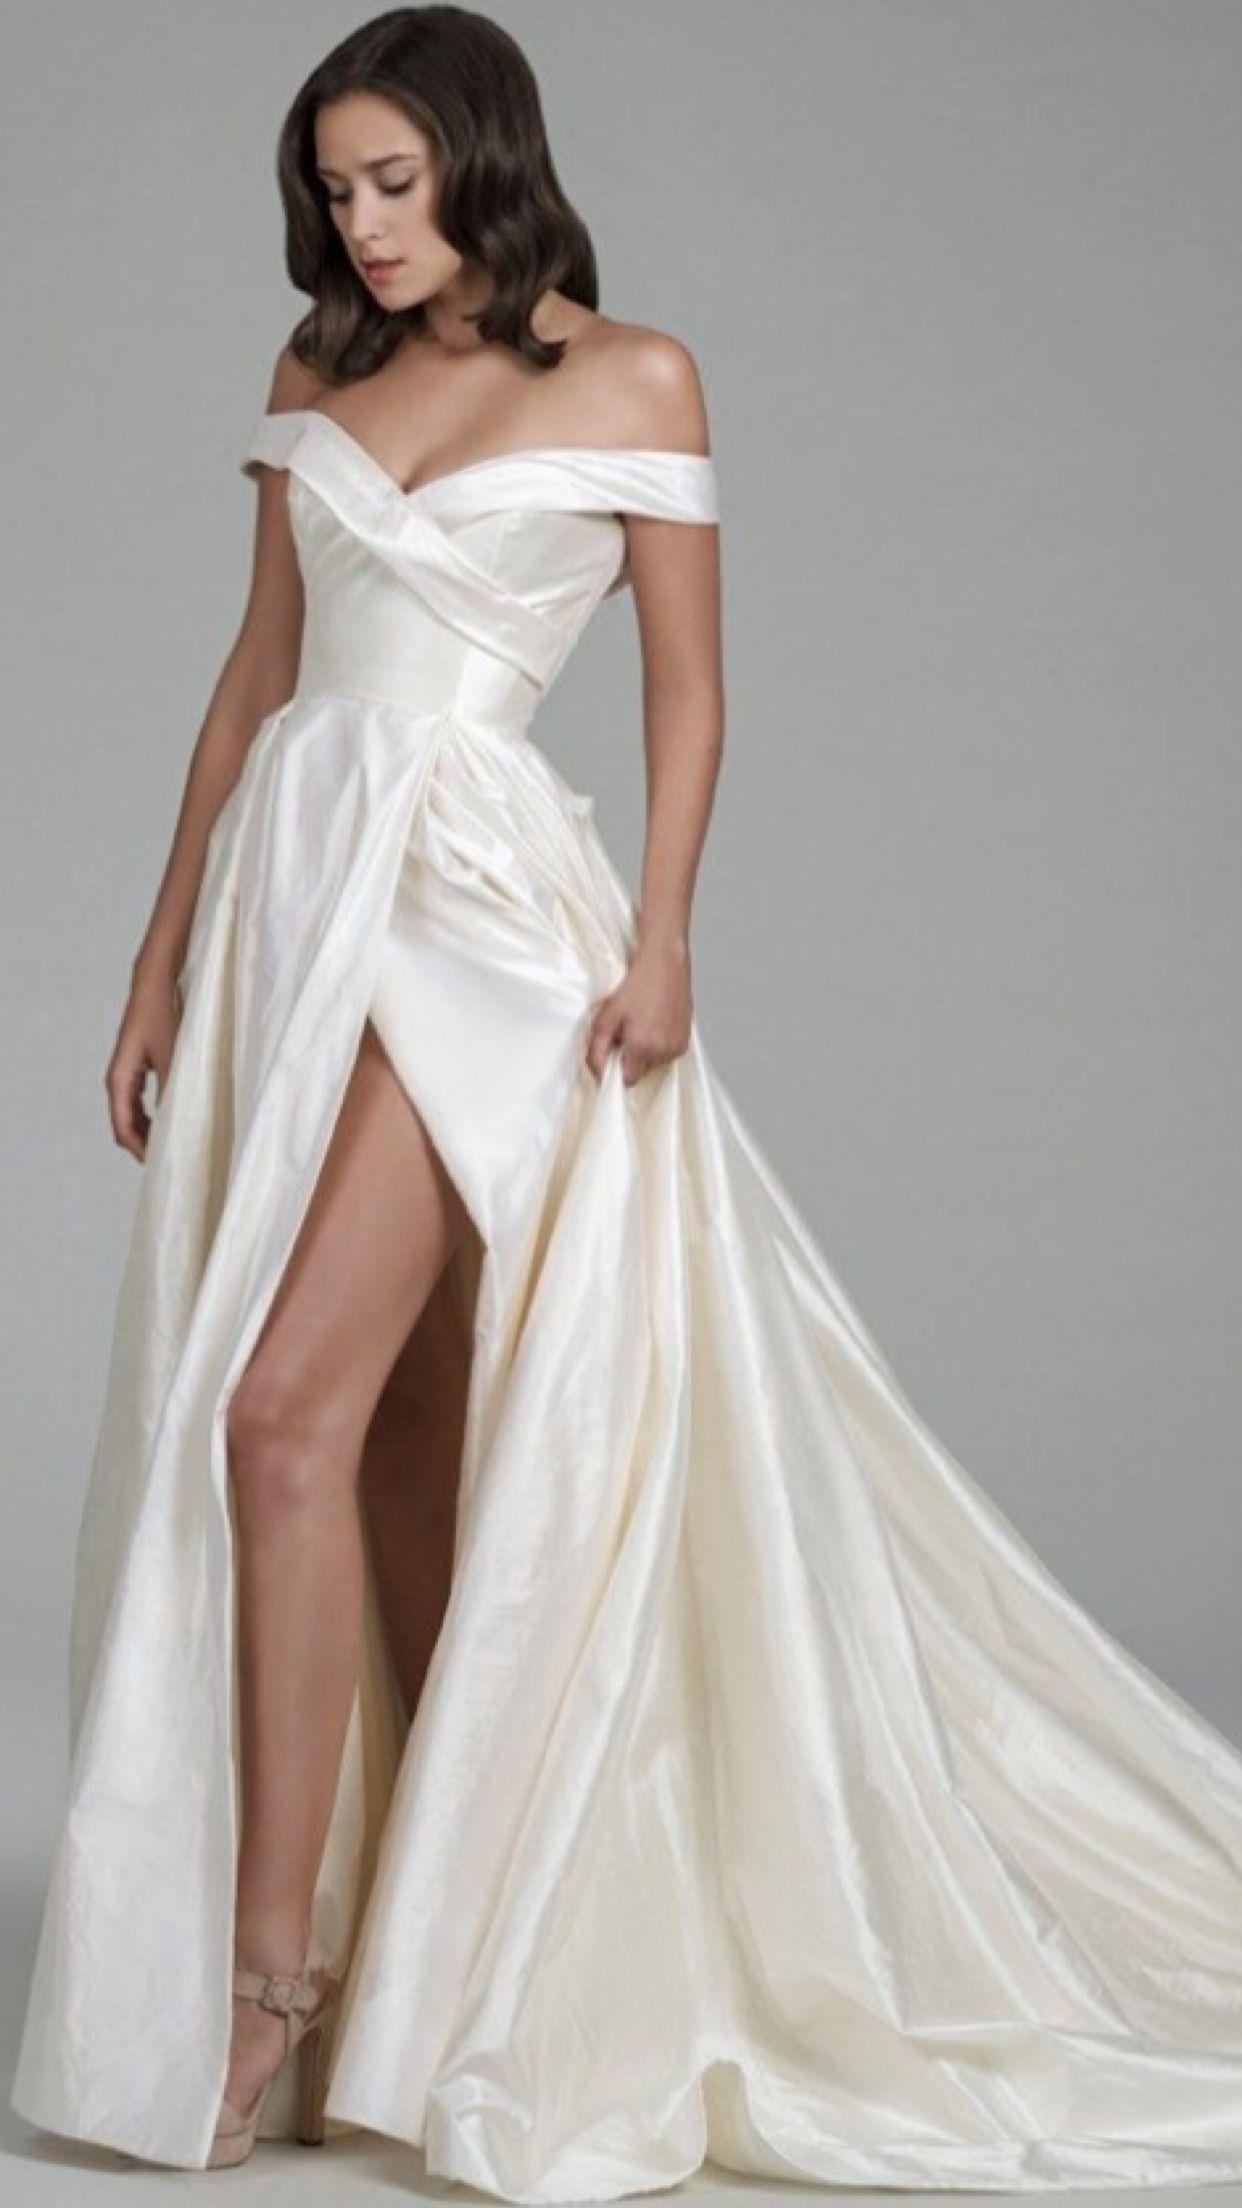 7d99e6fa84d Simple wedding dresses  satin  Wedding  offtheshoulder  slit  aline   Weddingdress  2018  fashion  new  sexy